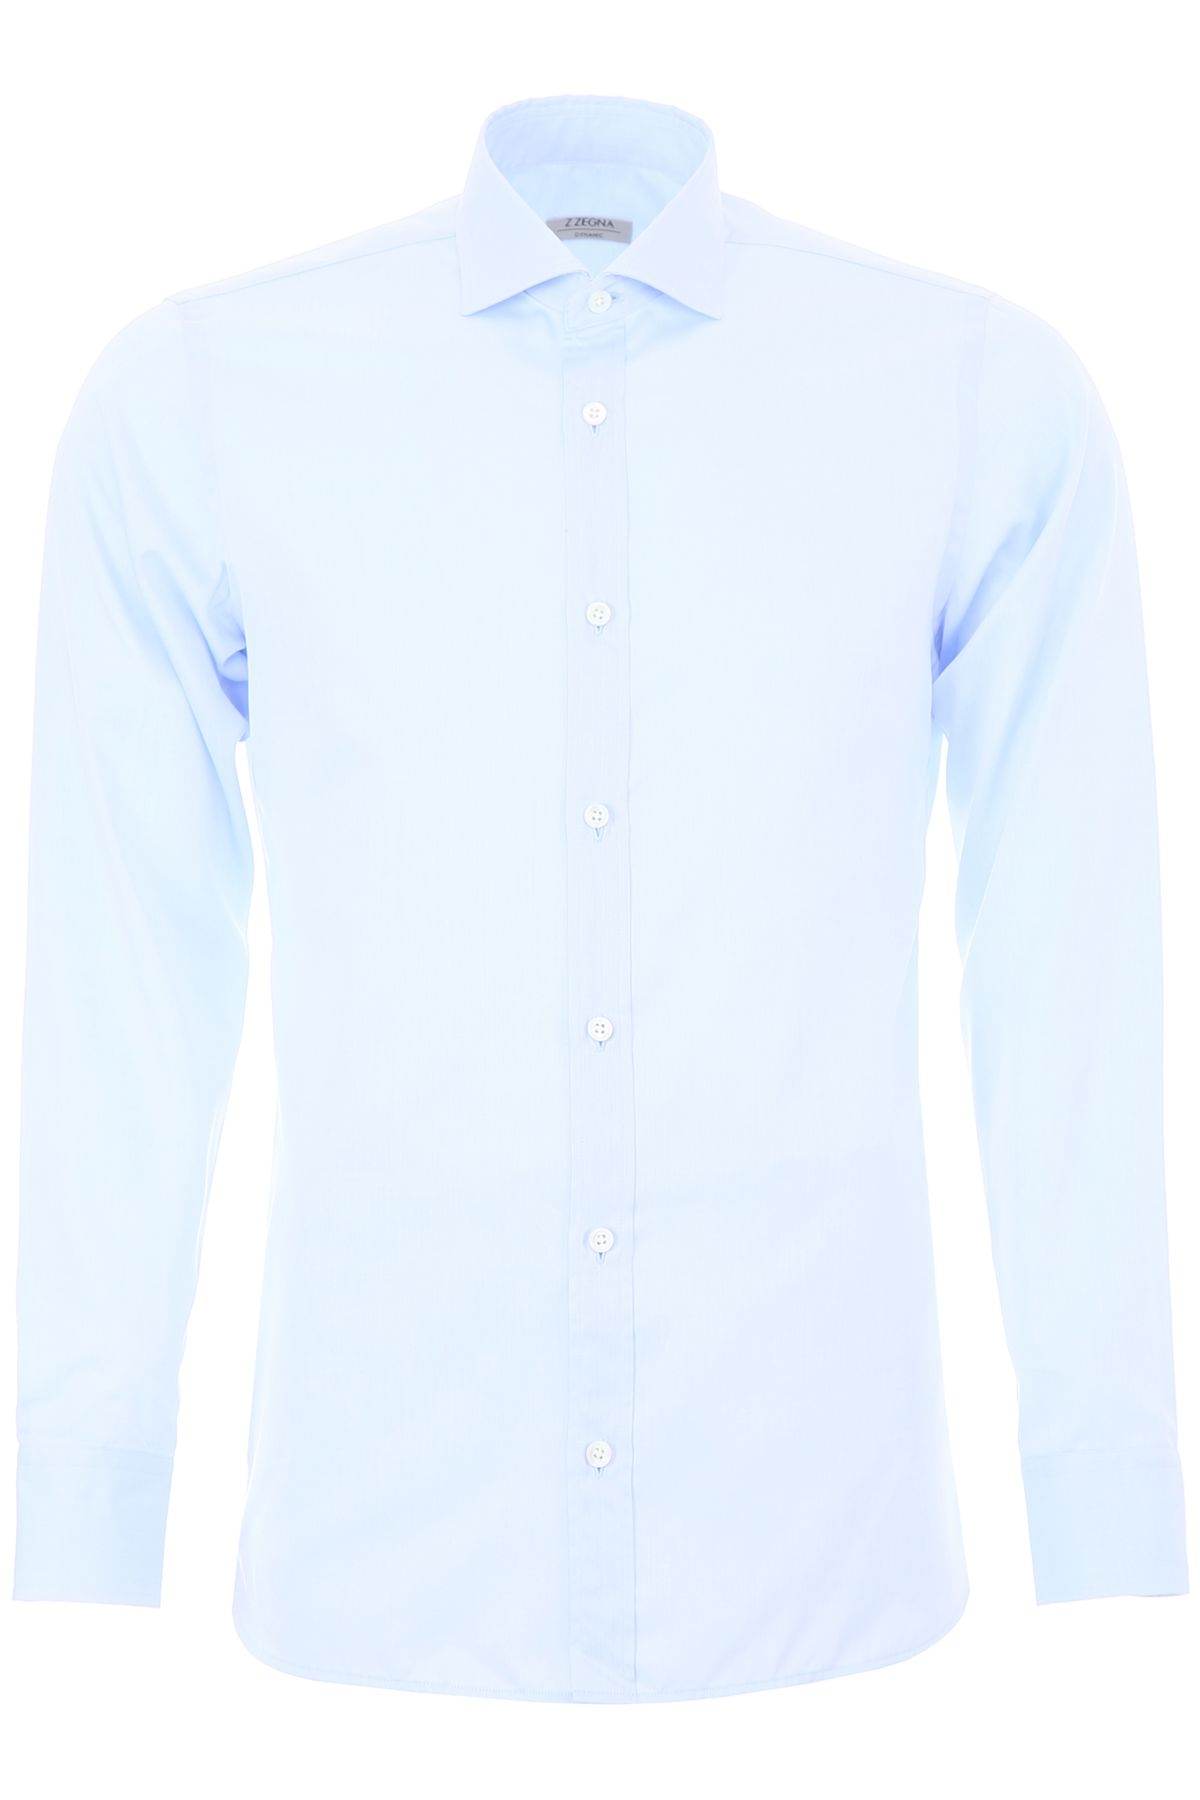 Z Zegna Dynamic Shirt